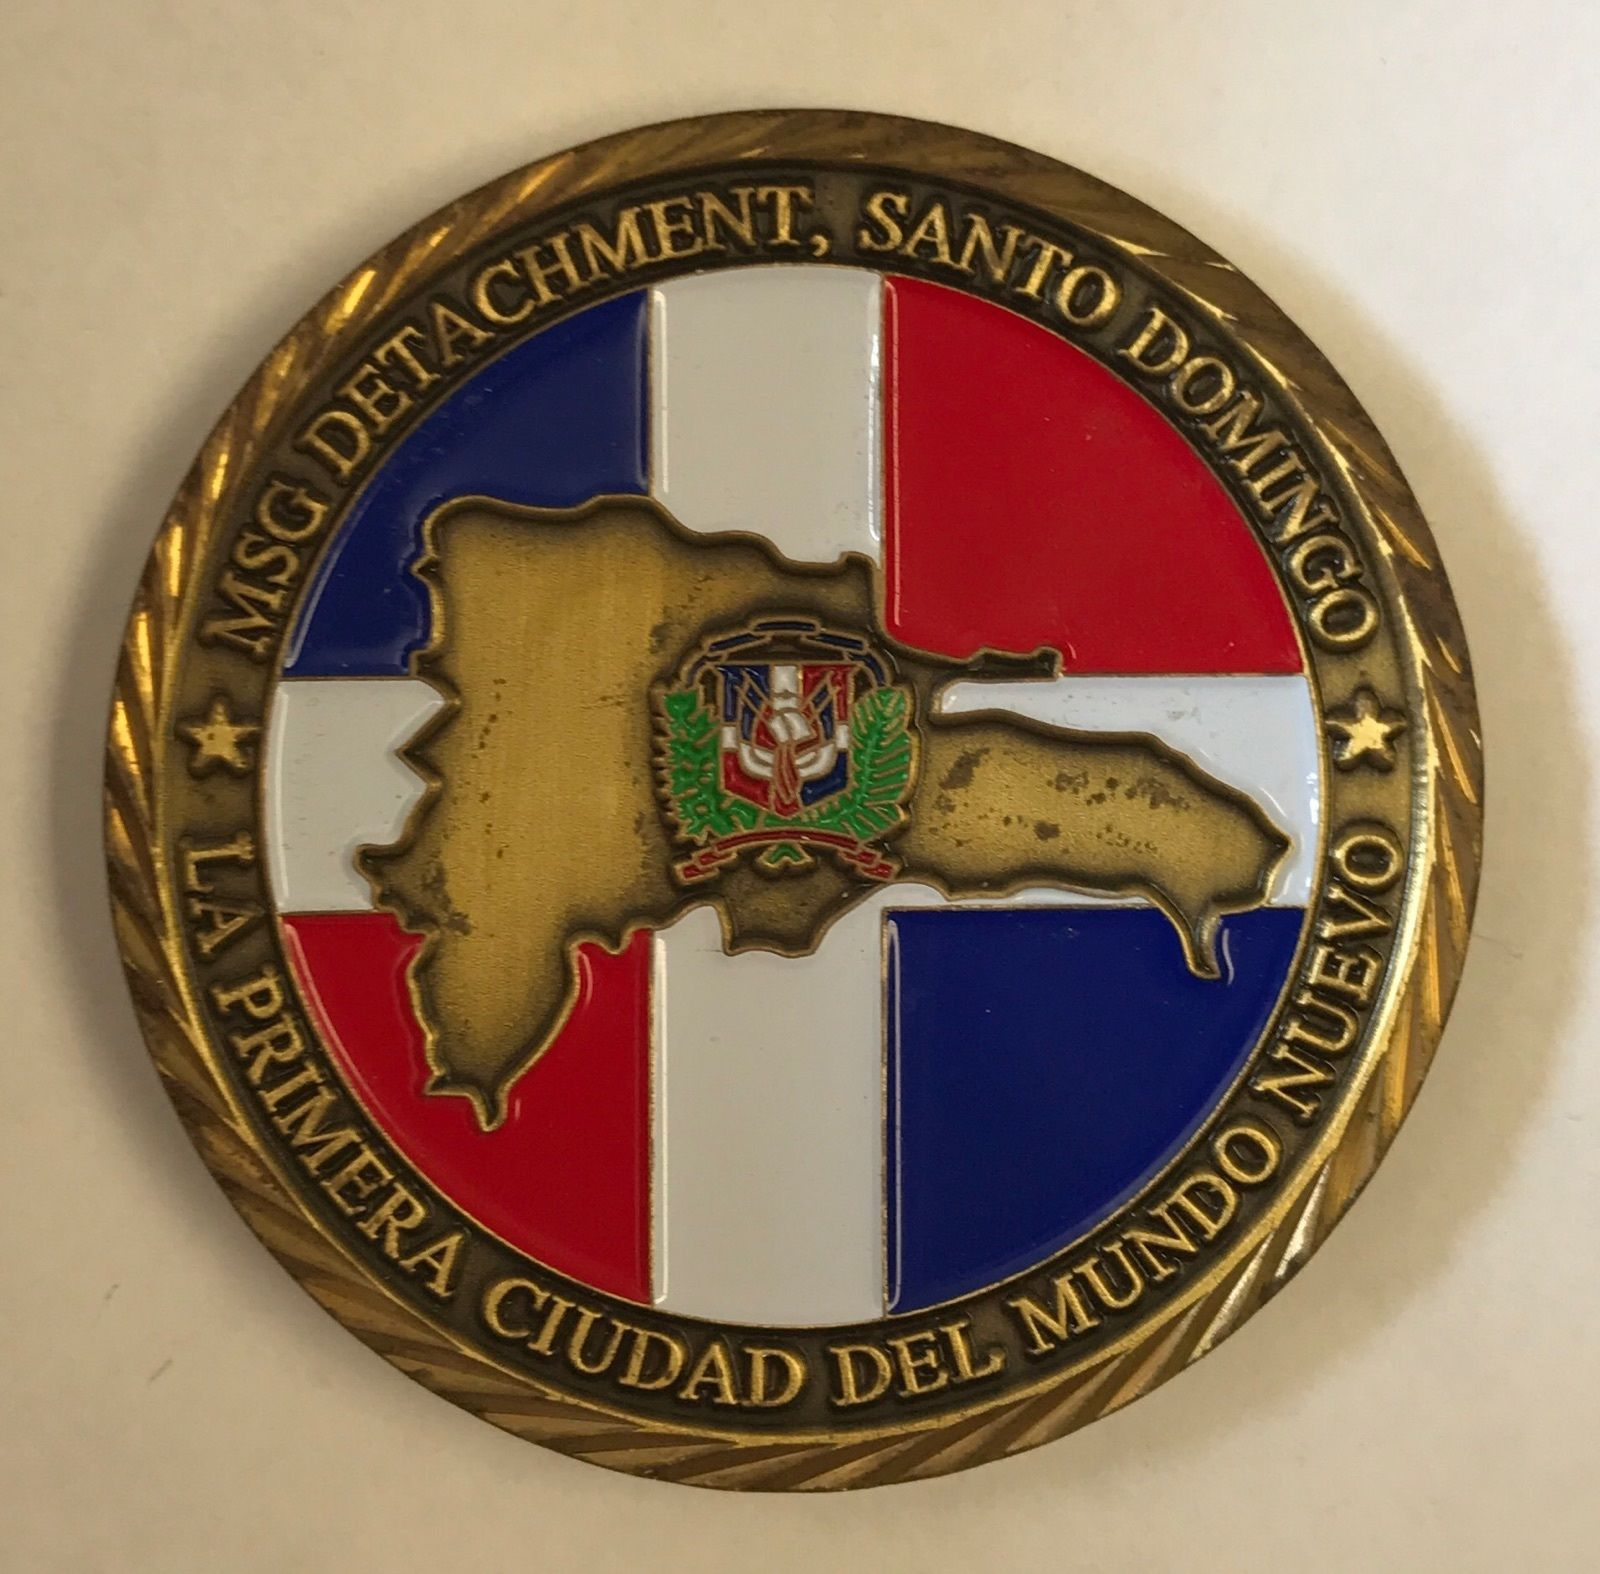 USMC MSG Det Marine Security Guard Det Santo And 50 Similar Items